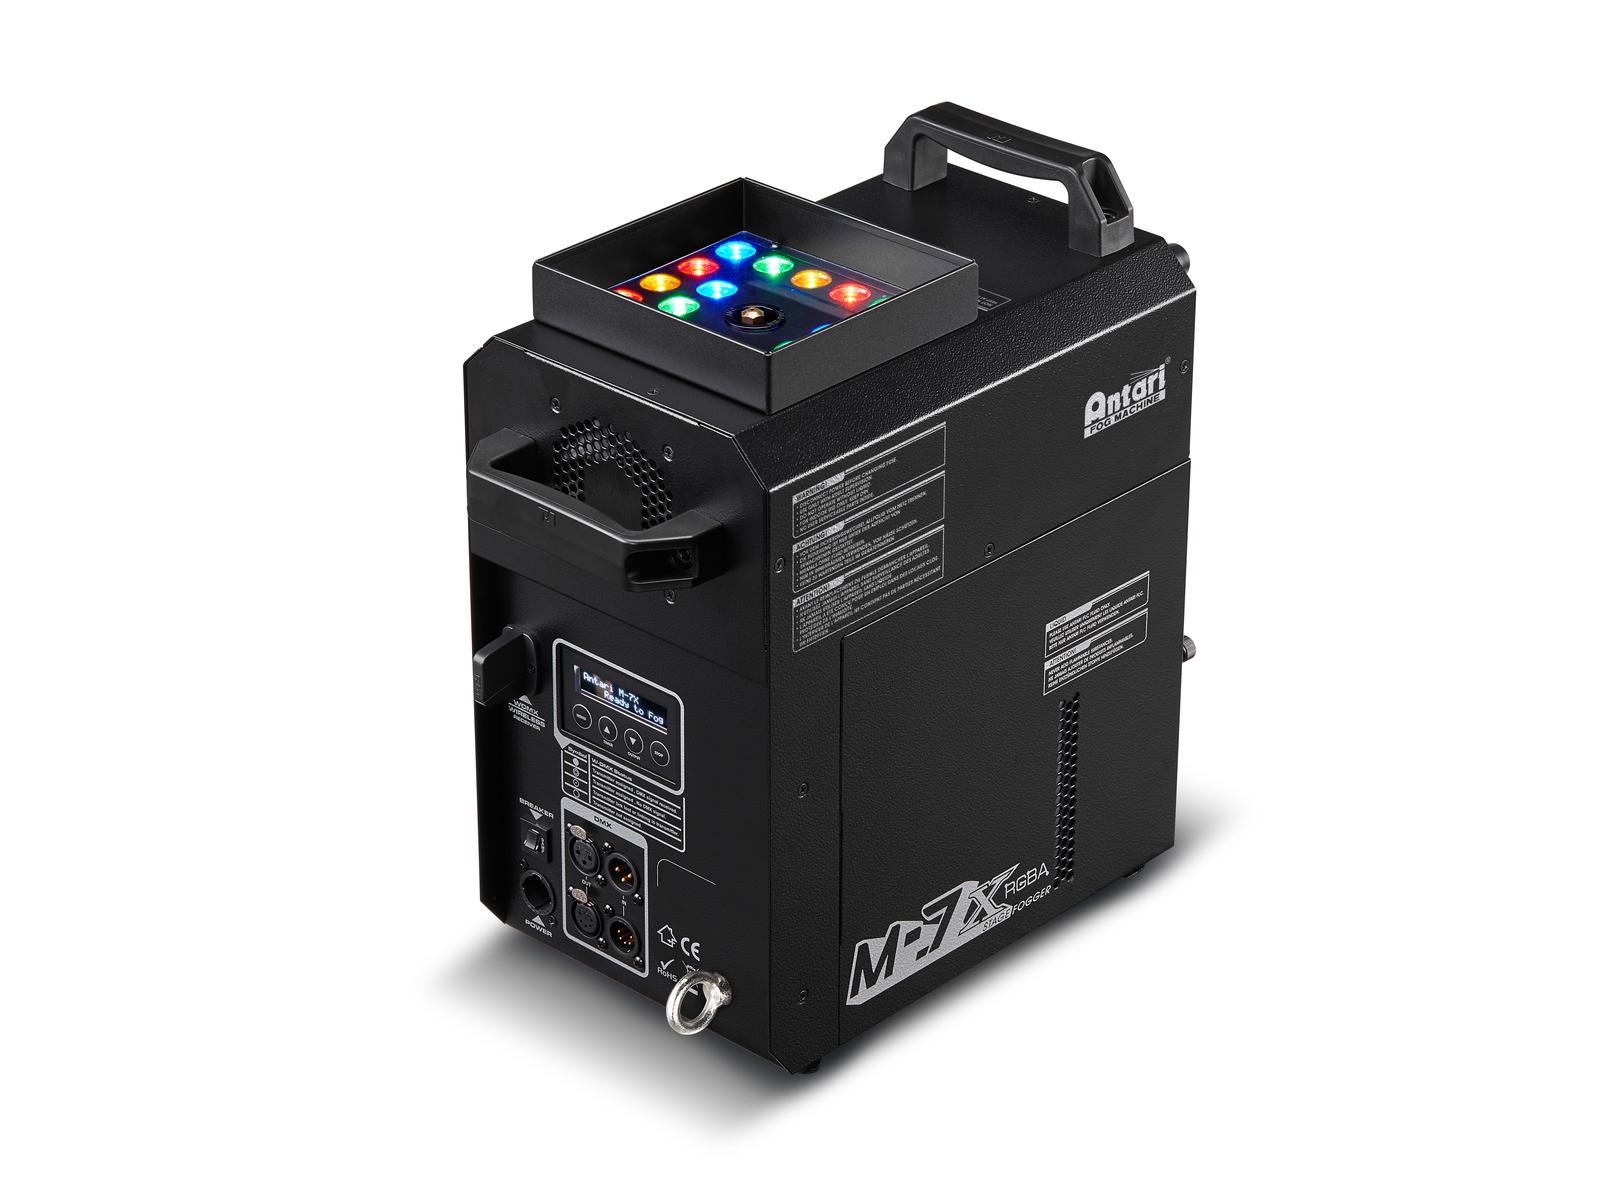 ANTARI M-7X RGBA Fase Fogger